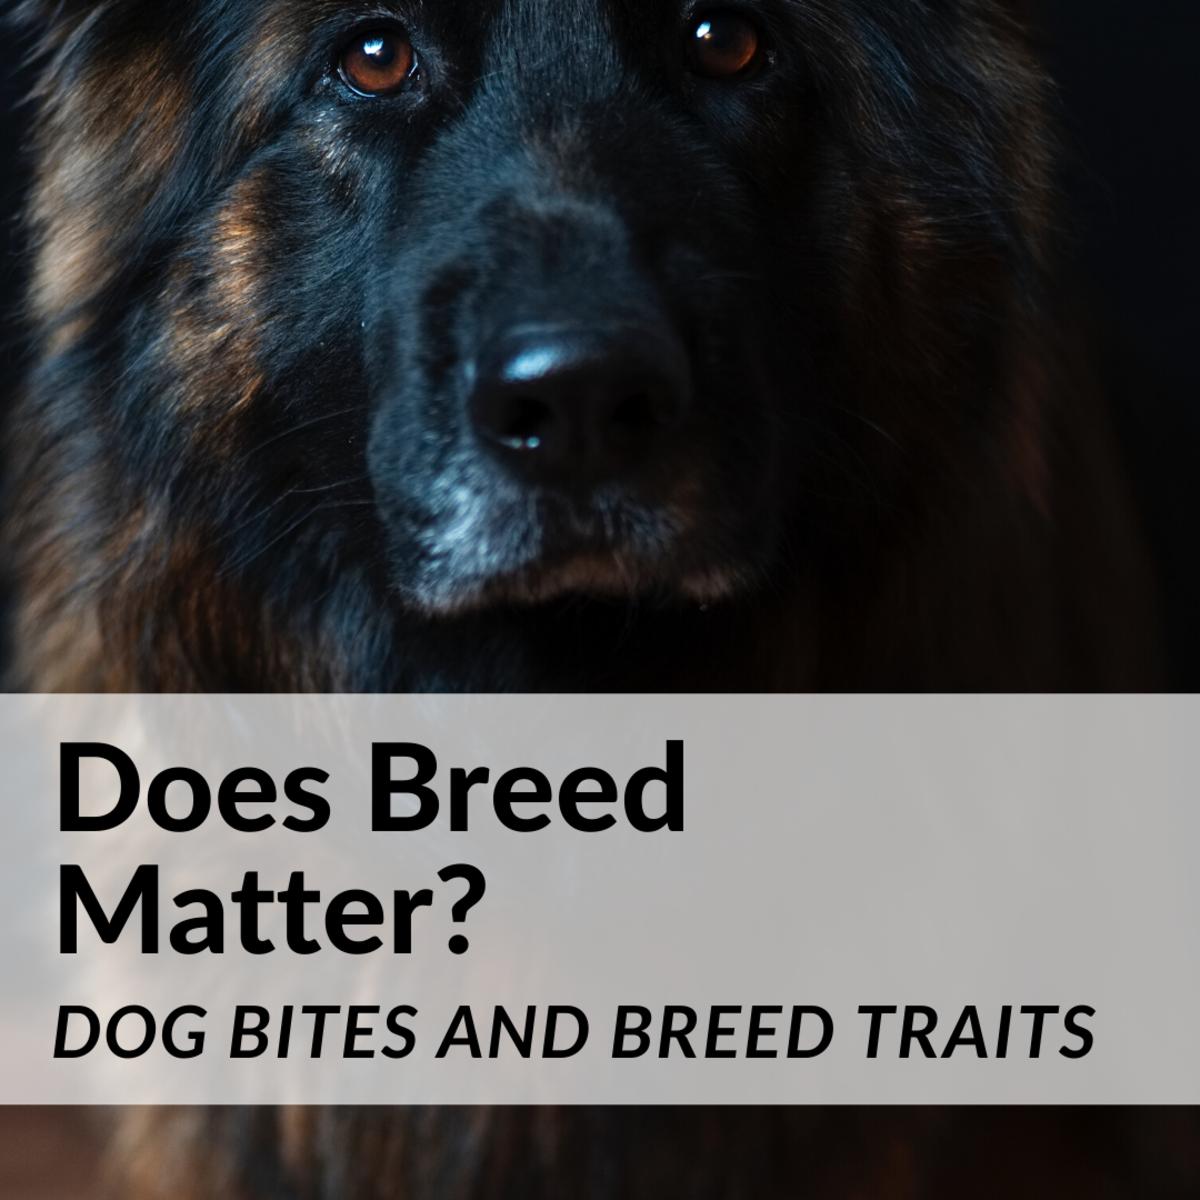 Breed Traits and Bite Statistics